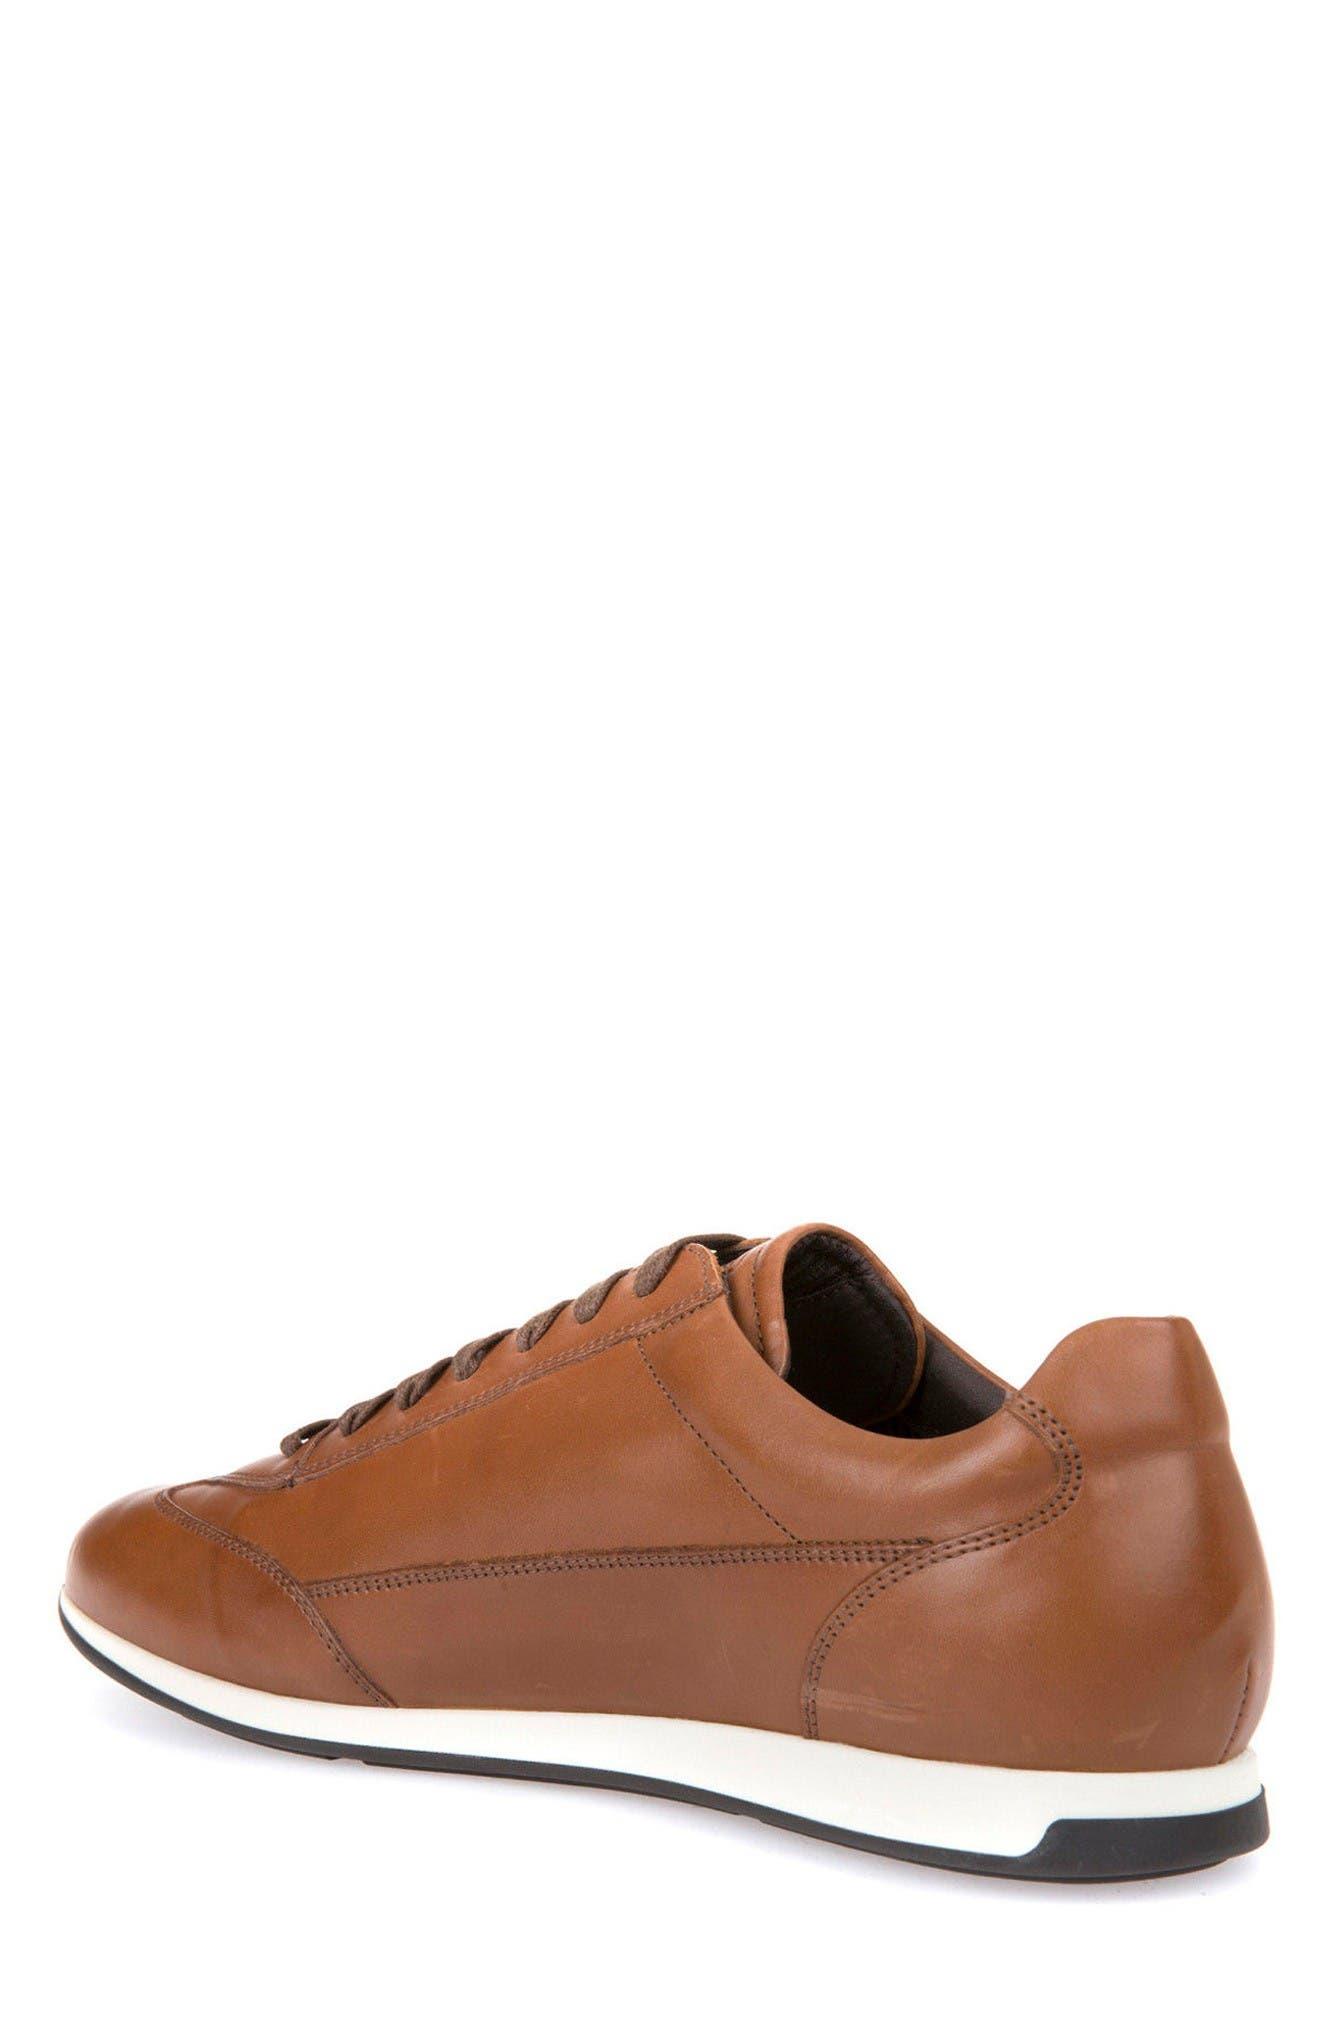 Alternate Image 2  - Geox Clemet 1 Sneaker (Men)